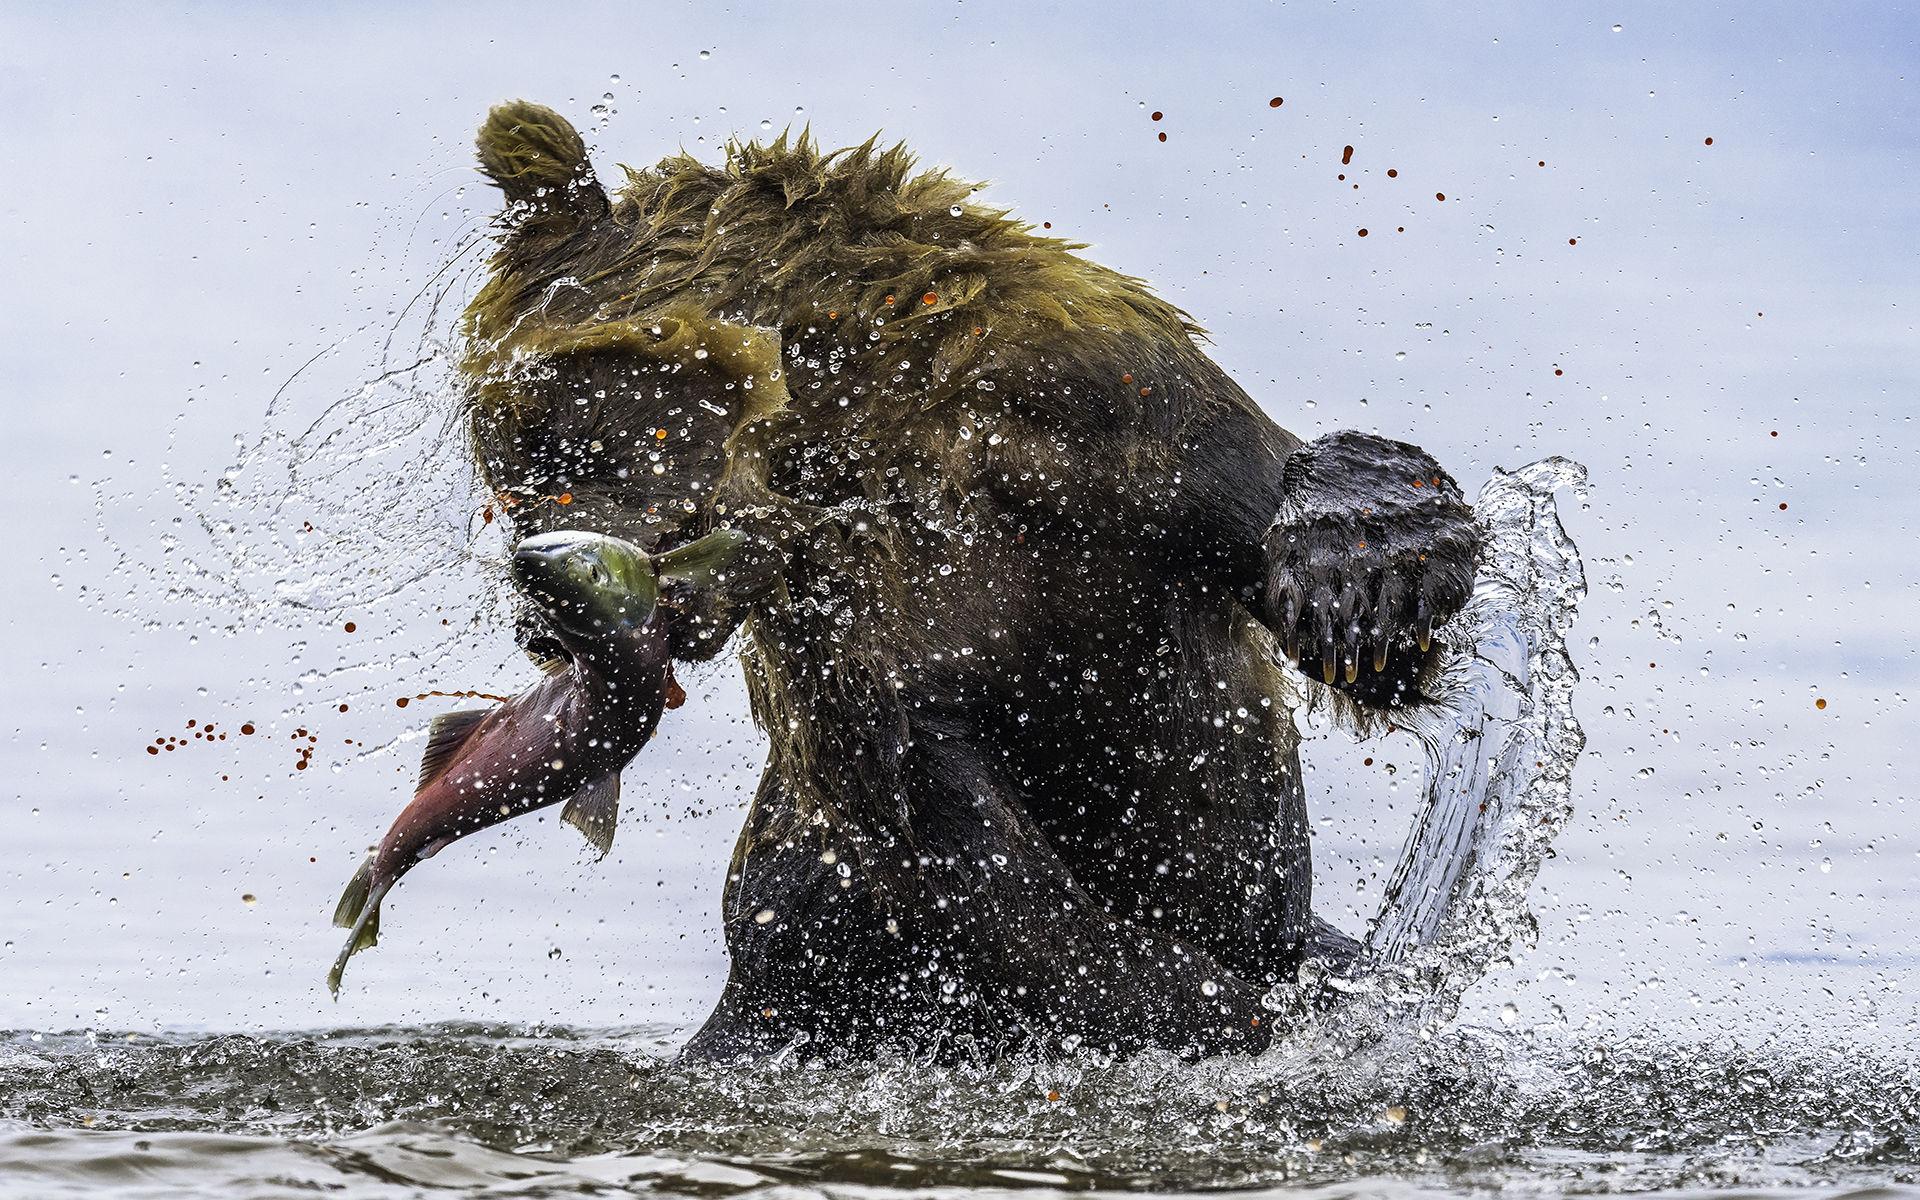 Vinnerbilder Oktober 2020 – Rovpattedyr